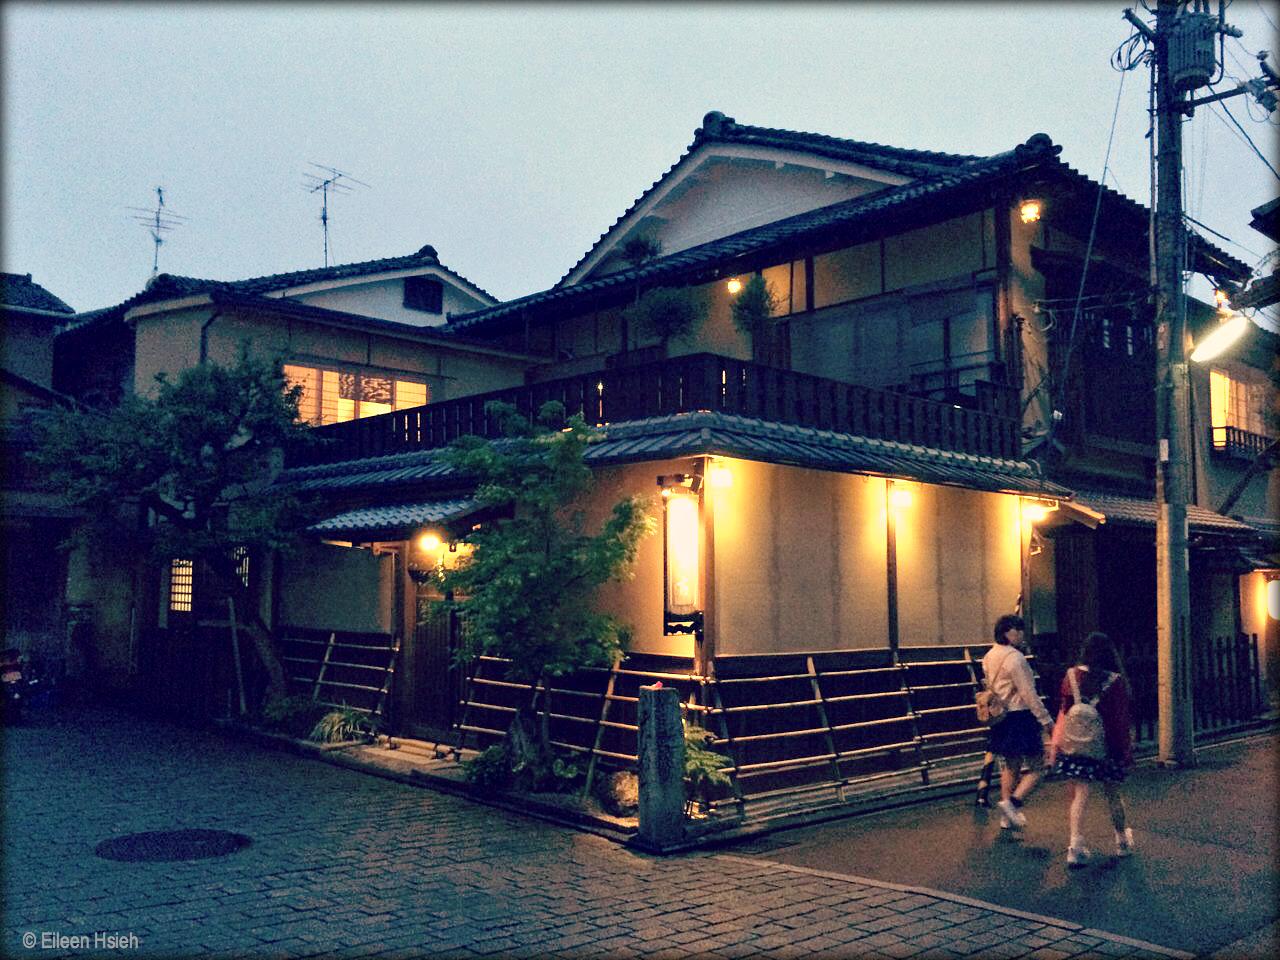 Motonago ryokan occupiesa hundred-year-old wooden building in Kyoto'shistoric Higashiyama district.元奈古旅館位於京都有許多 代表性寺院、神社的東山區。  © Eileen Hsieh